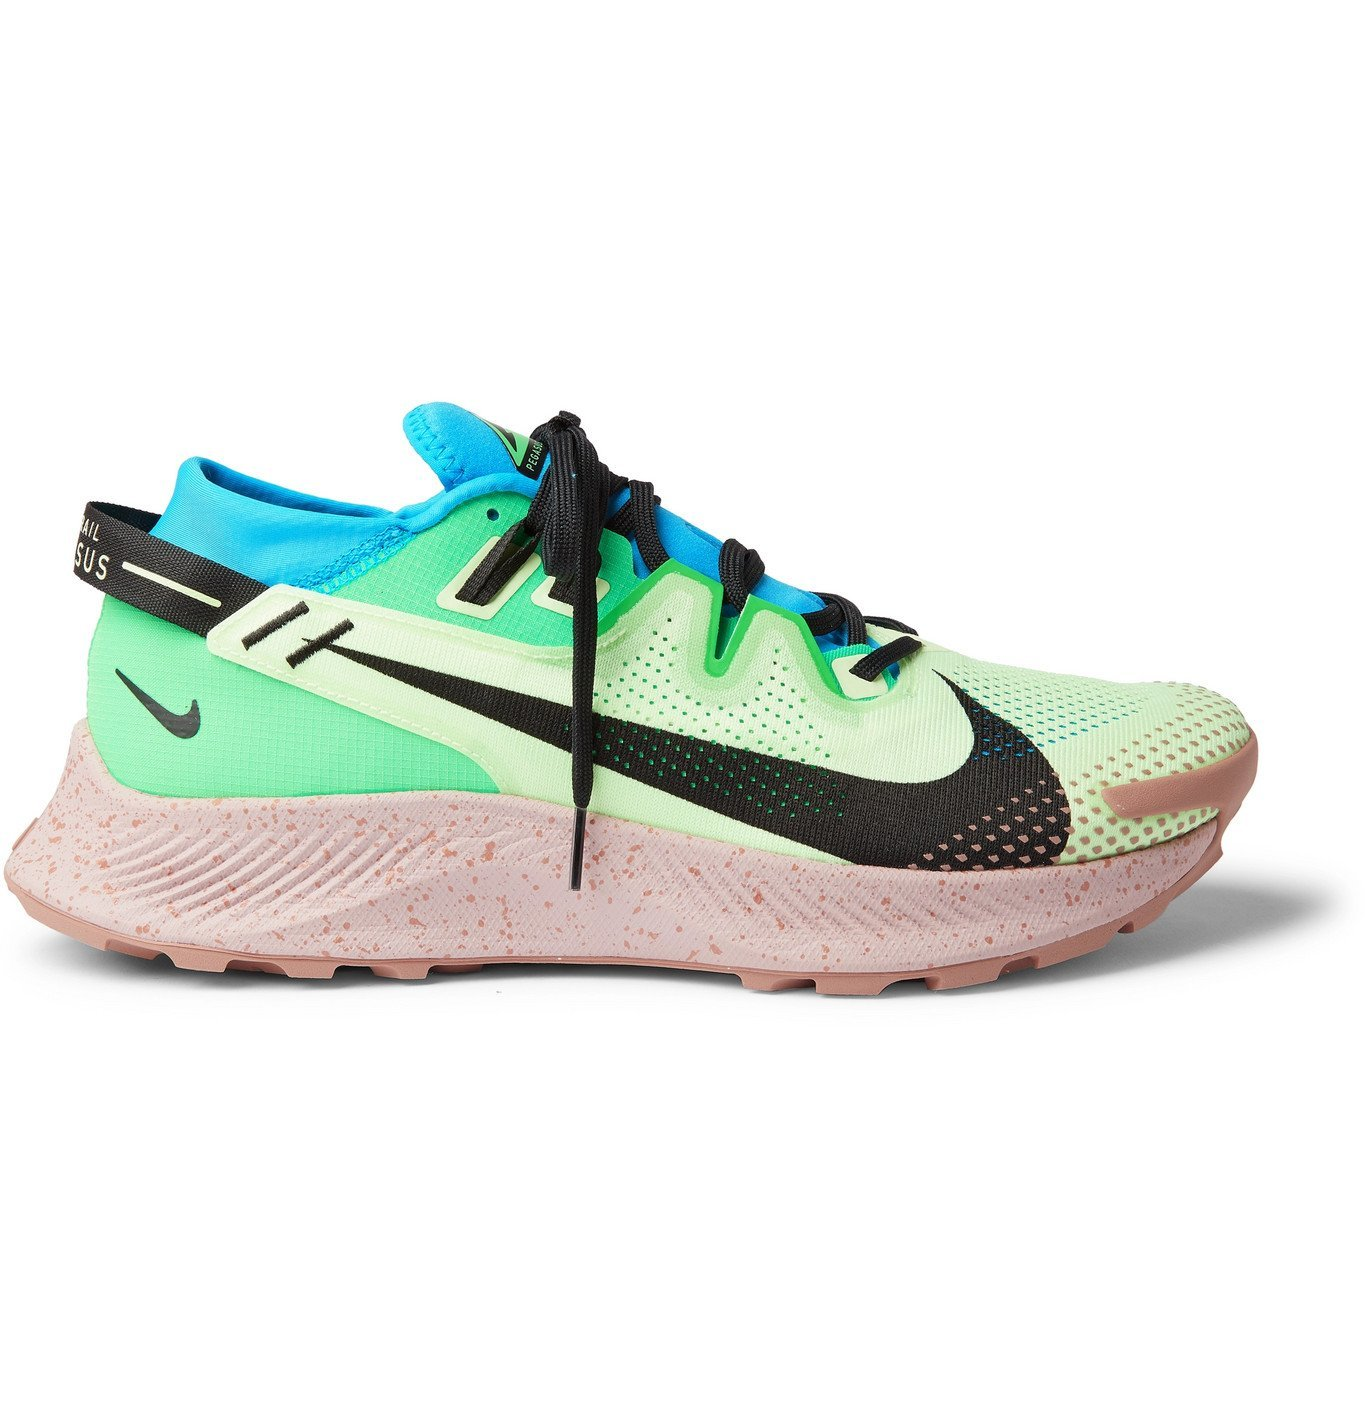 Nike Running - Pegasus Trail 2 Mesh, Ripstop and Neoprene Sneakers - Green